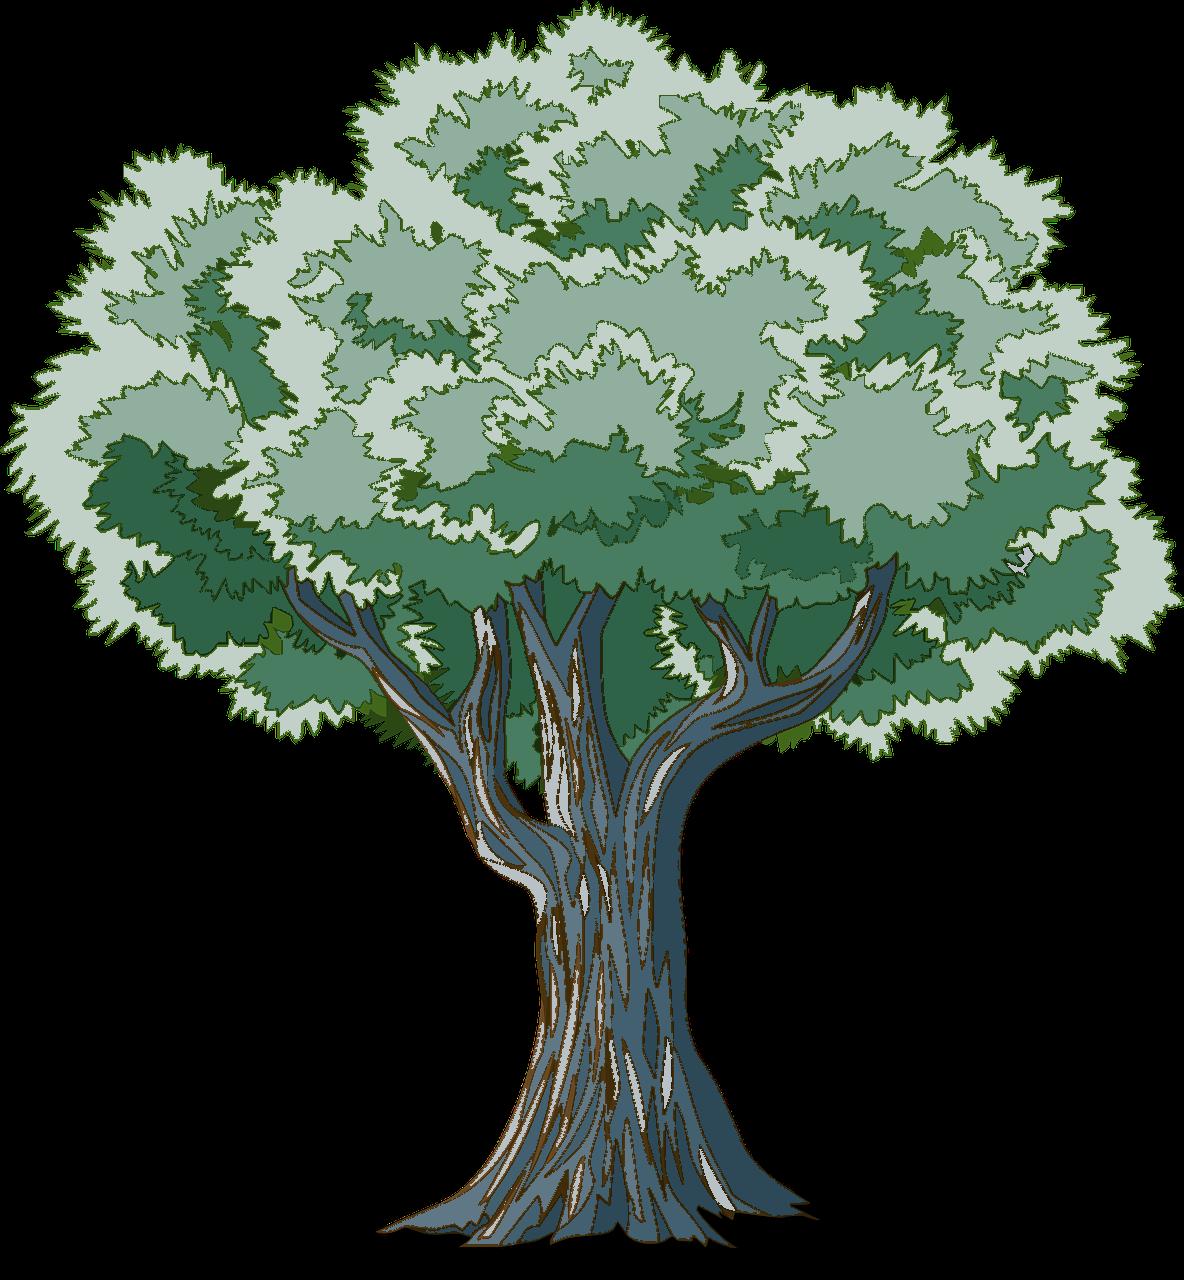 tree-576847_1280